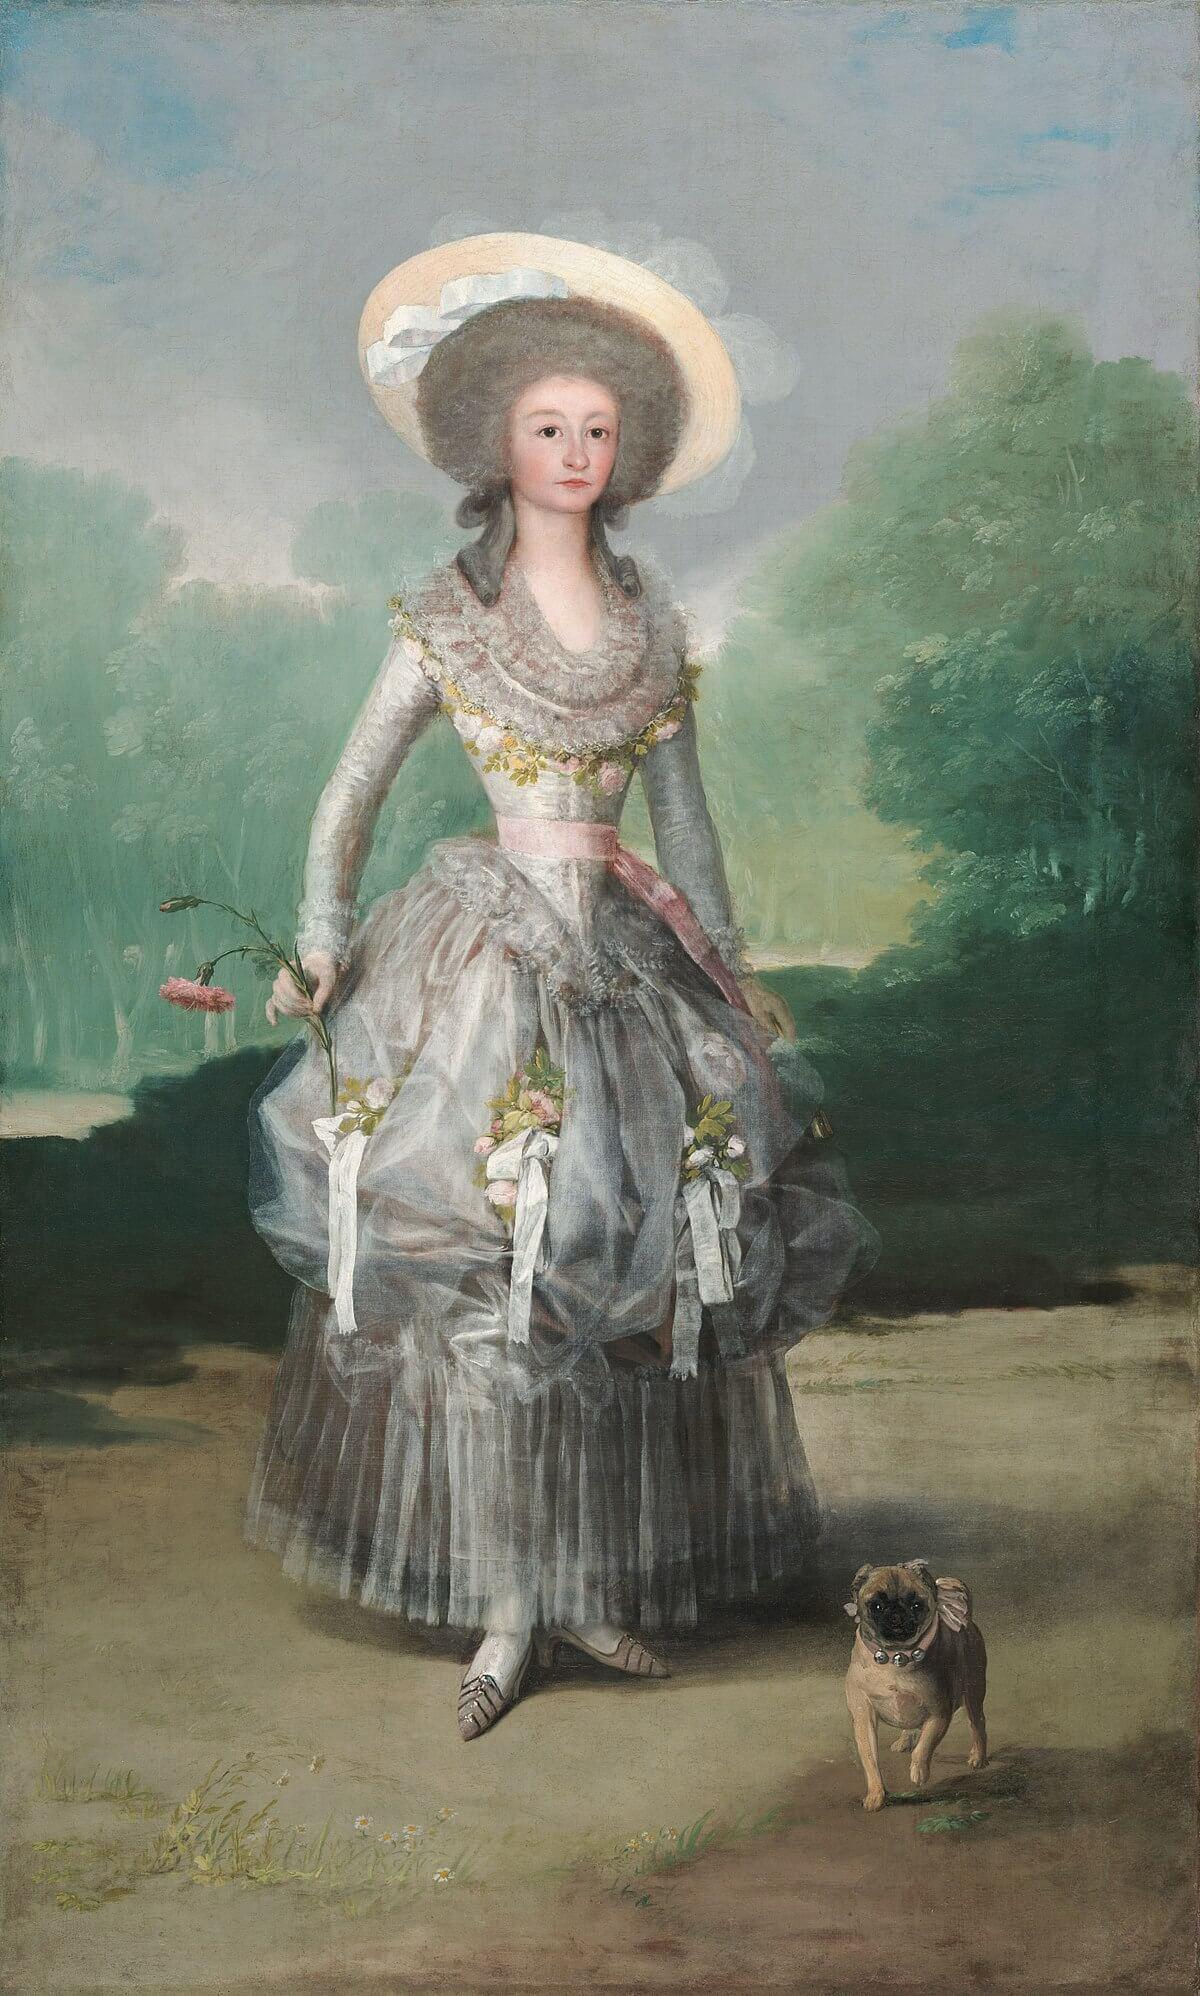 Figure 5. Goya, Marquesa de Pontejos.